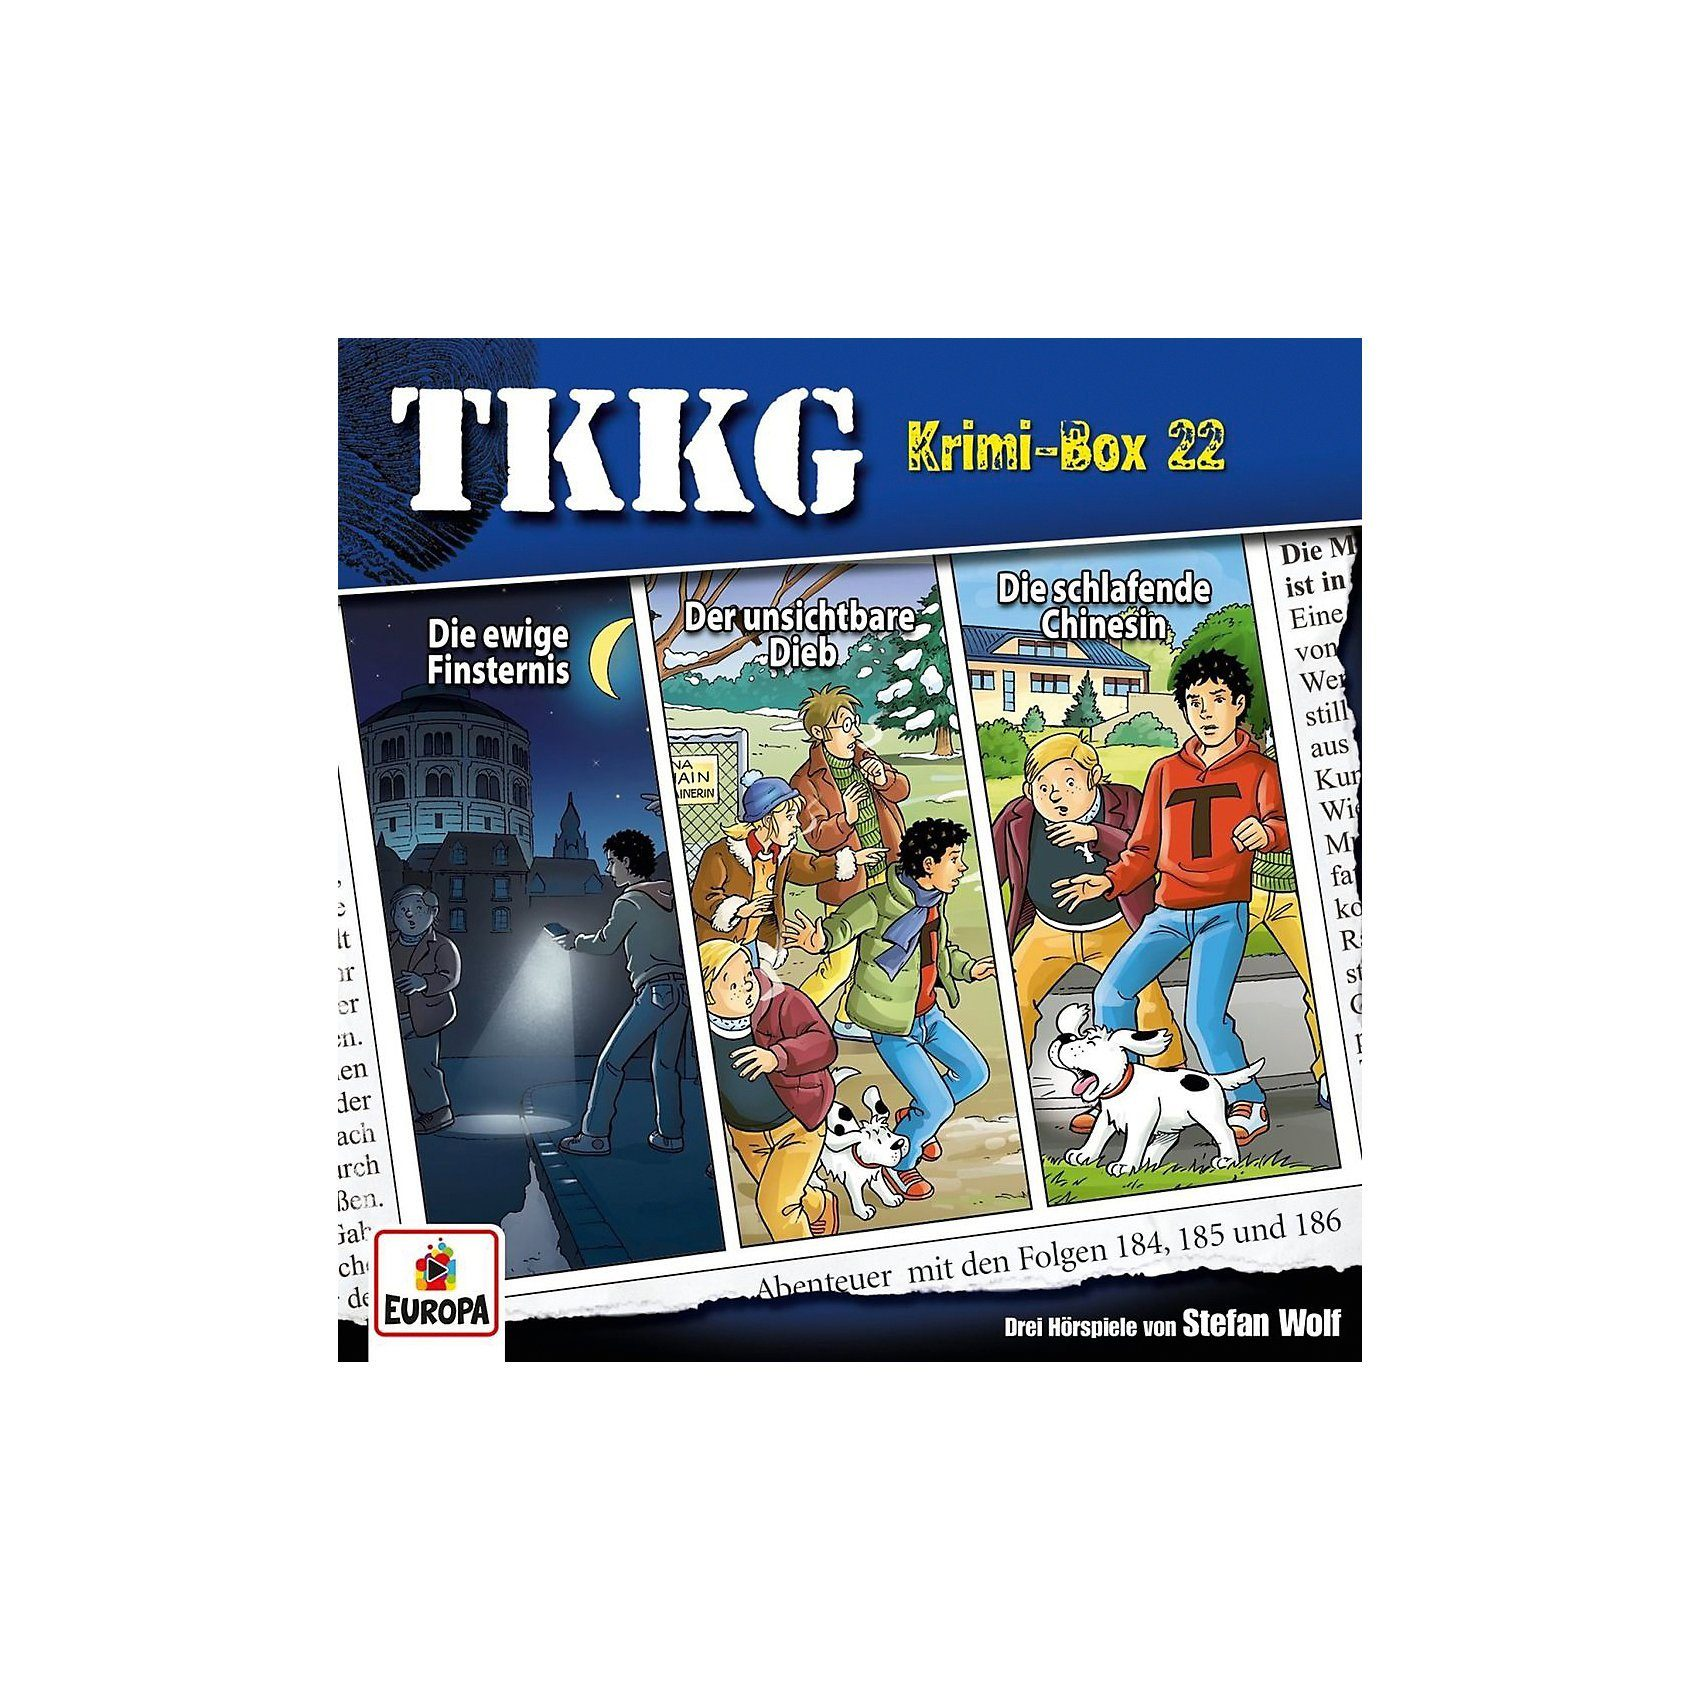 Sony CD TKKG Krimi-Box 22 (Folgen 184,185,186)